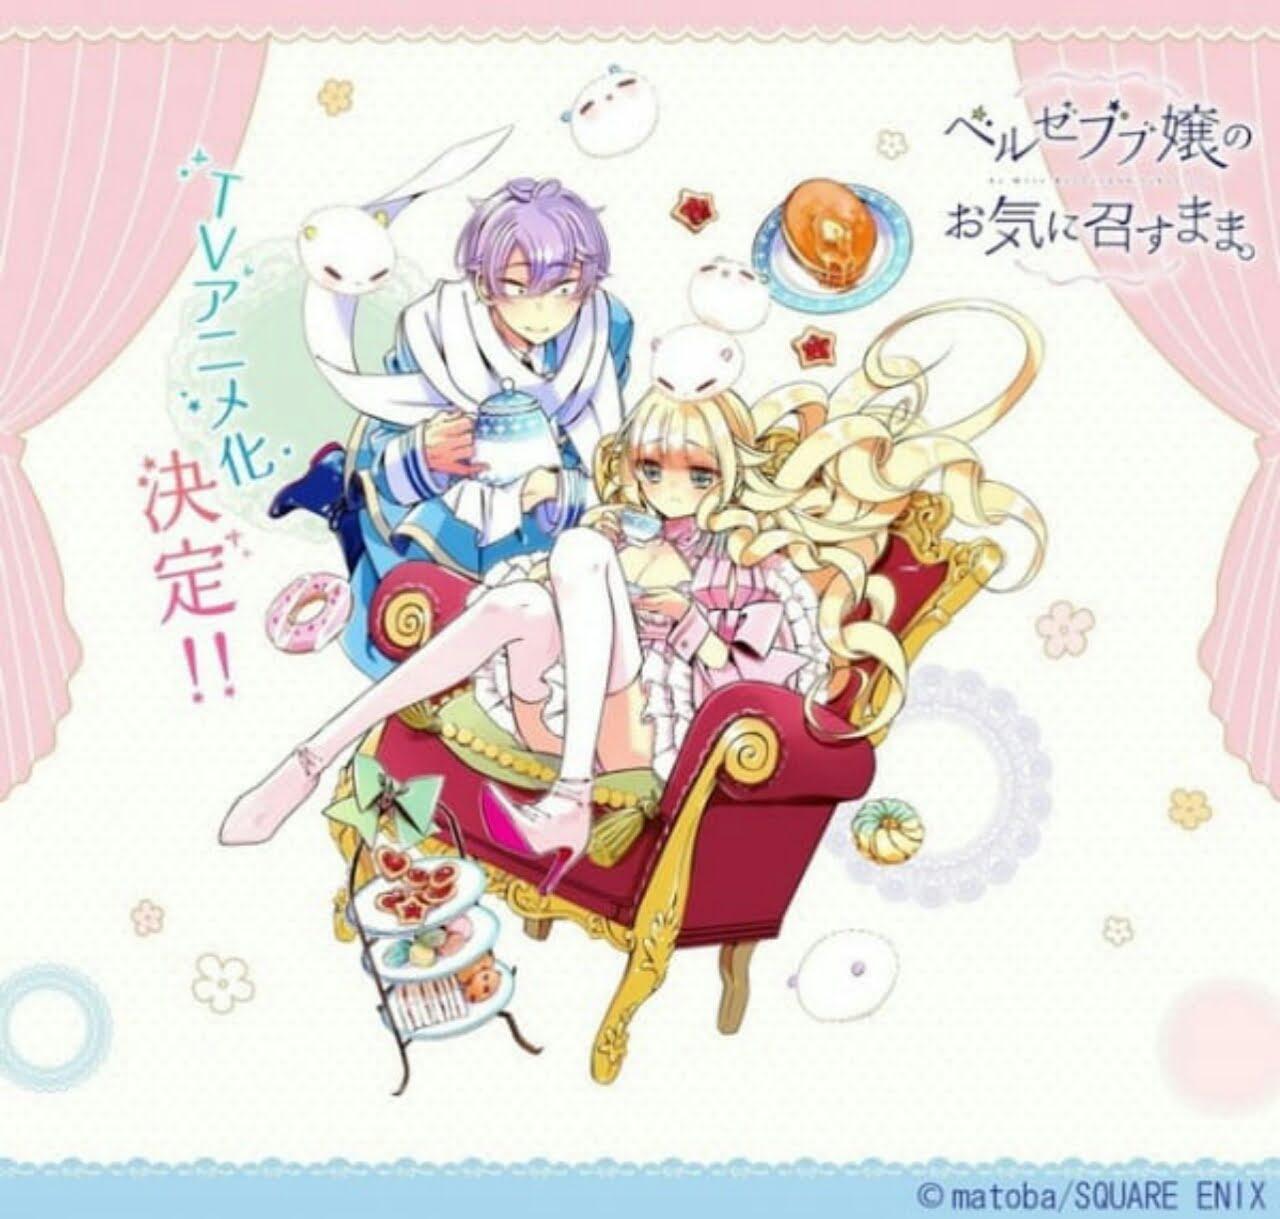 matoba, Kreator Manga As Miss Beelzebub Likes, Mempersiapkan Karya Baru 1